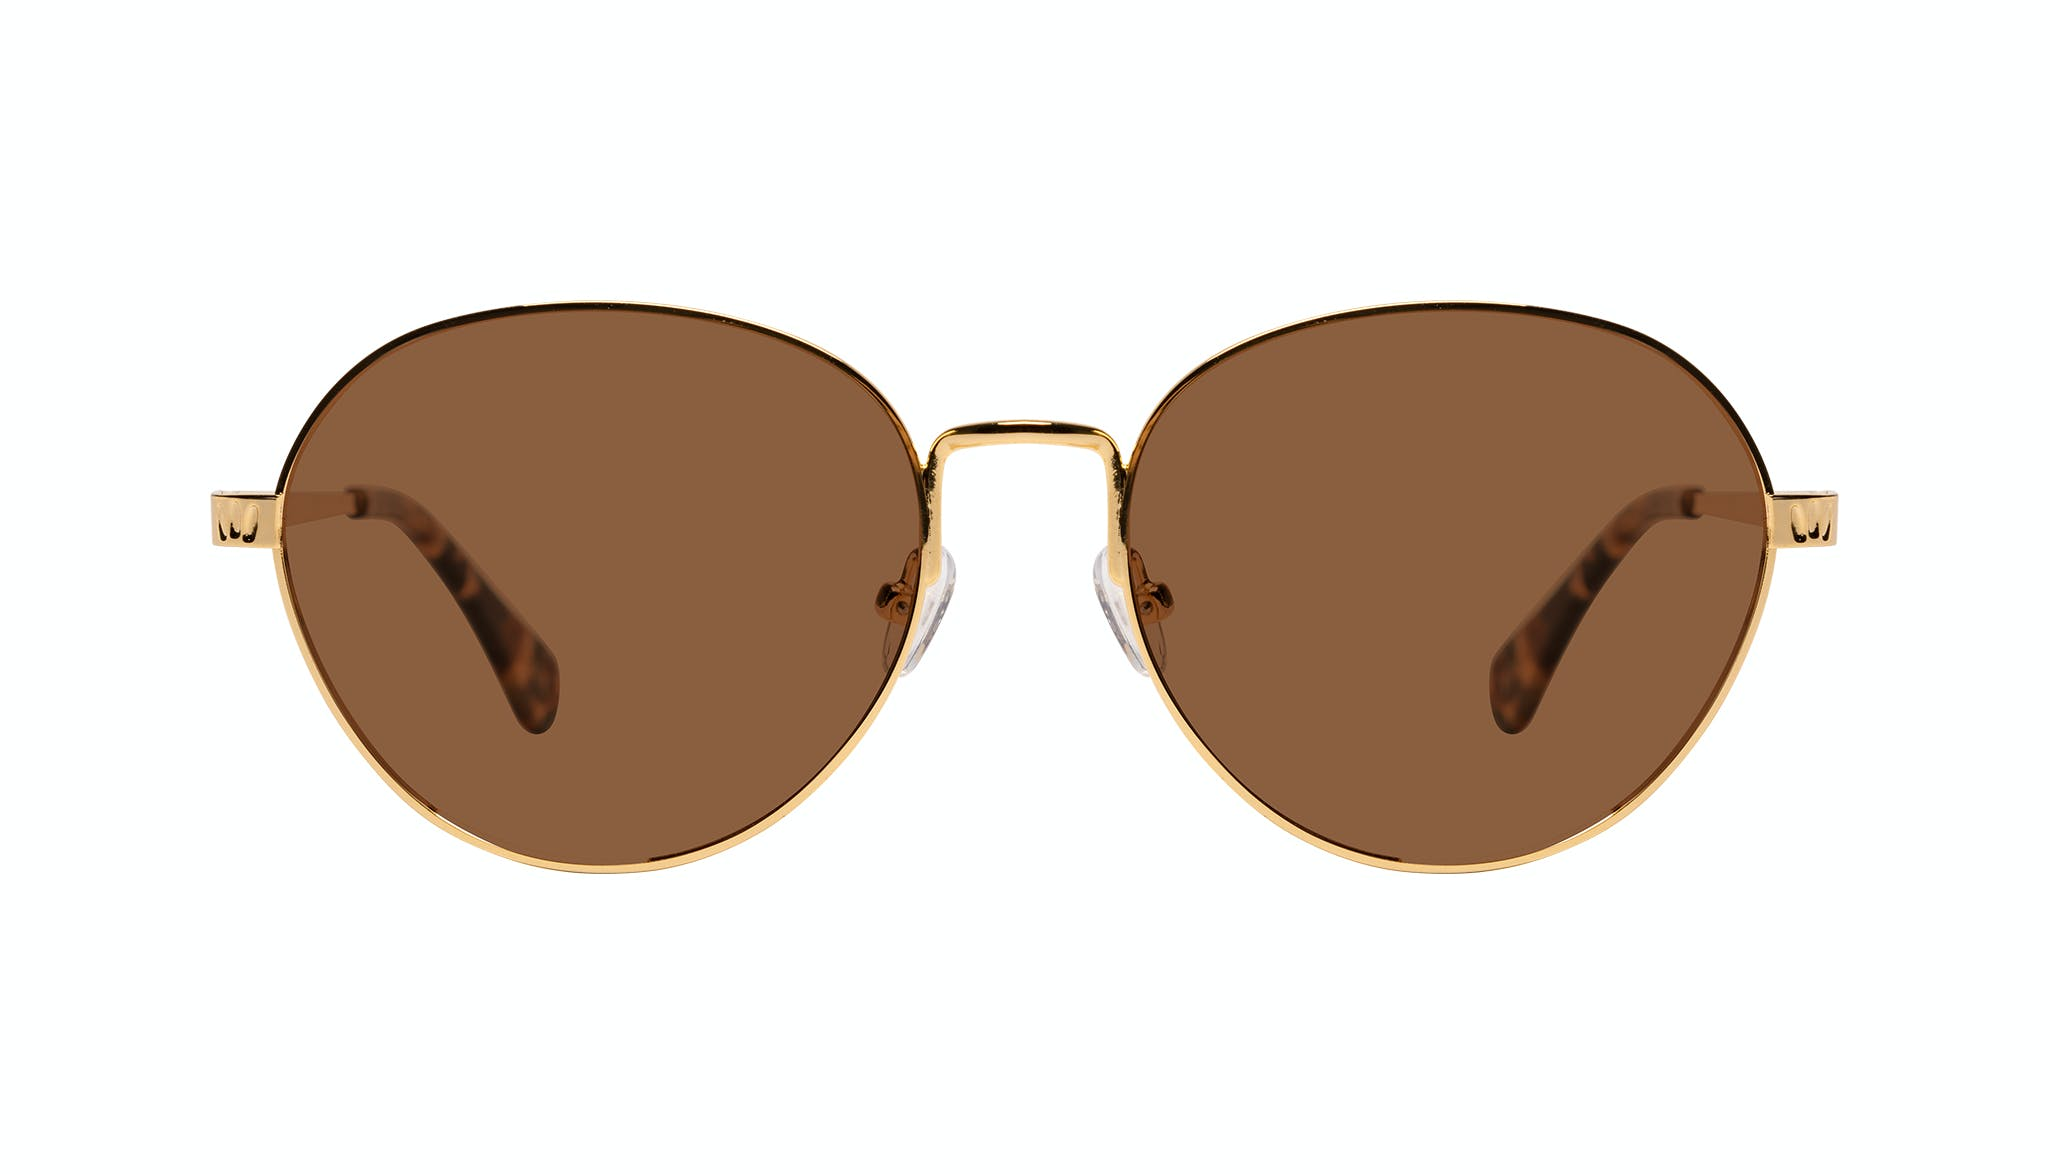 Affordable Fashion Glasses Round Sunglasses Women Brace Plus Gold Front